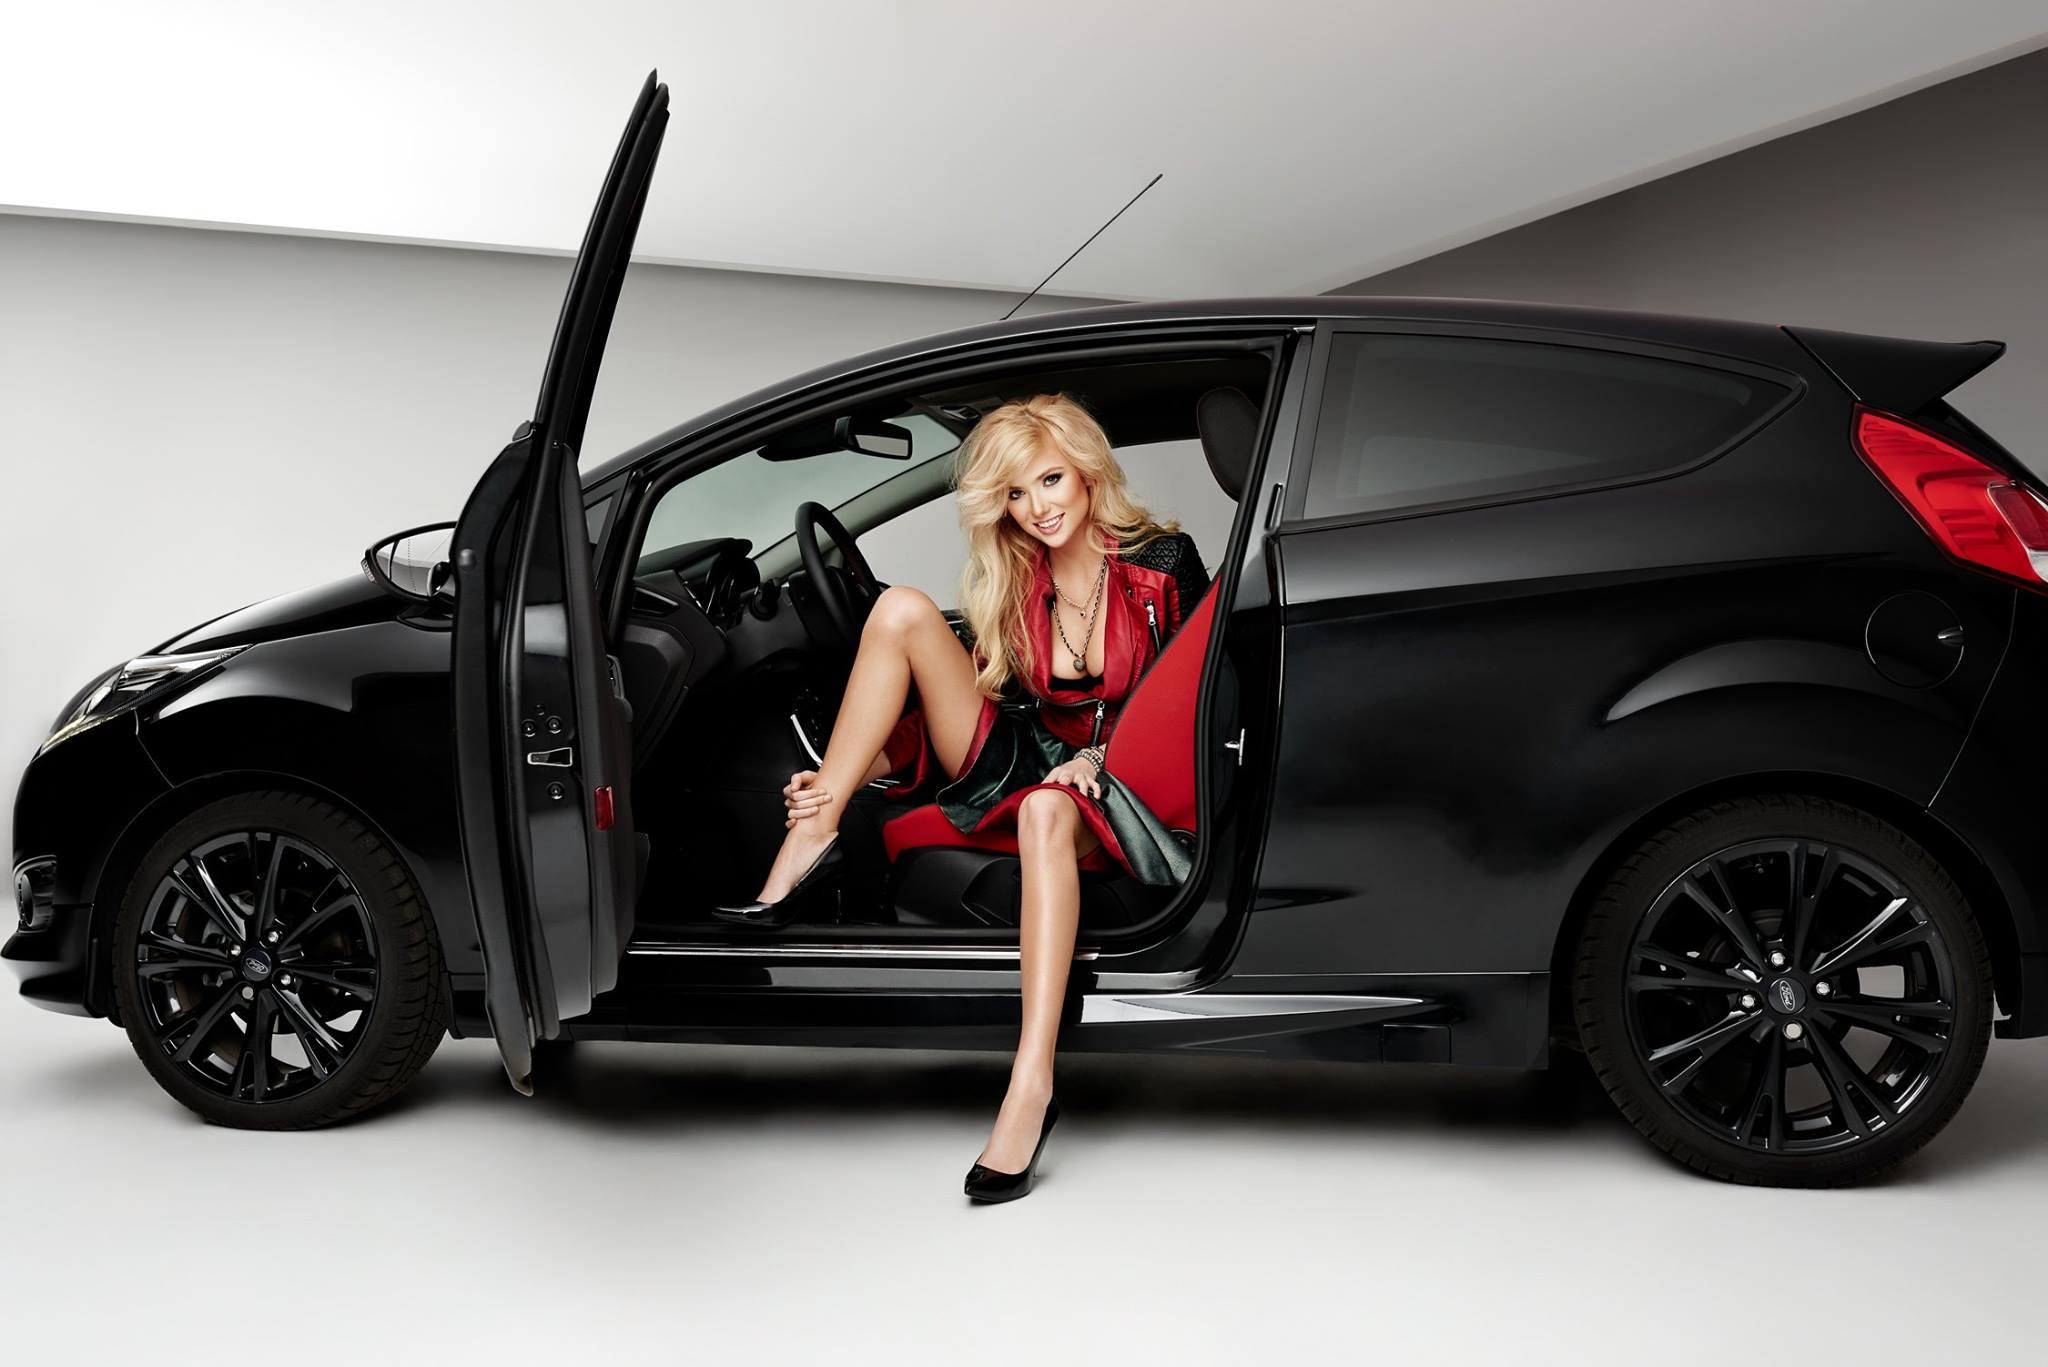 ... Polish Blonde Model Agata Makes a Ford Fiesta Black Edition Look Hot ... & Polish Blonde Model Agata Makes a Ford Fiesta Black Edition Look ... markmcfarlin.com